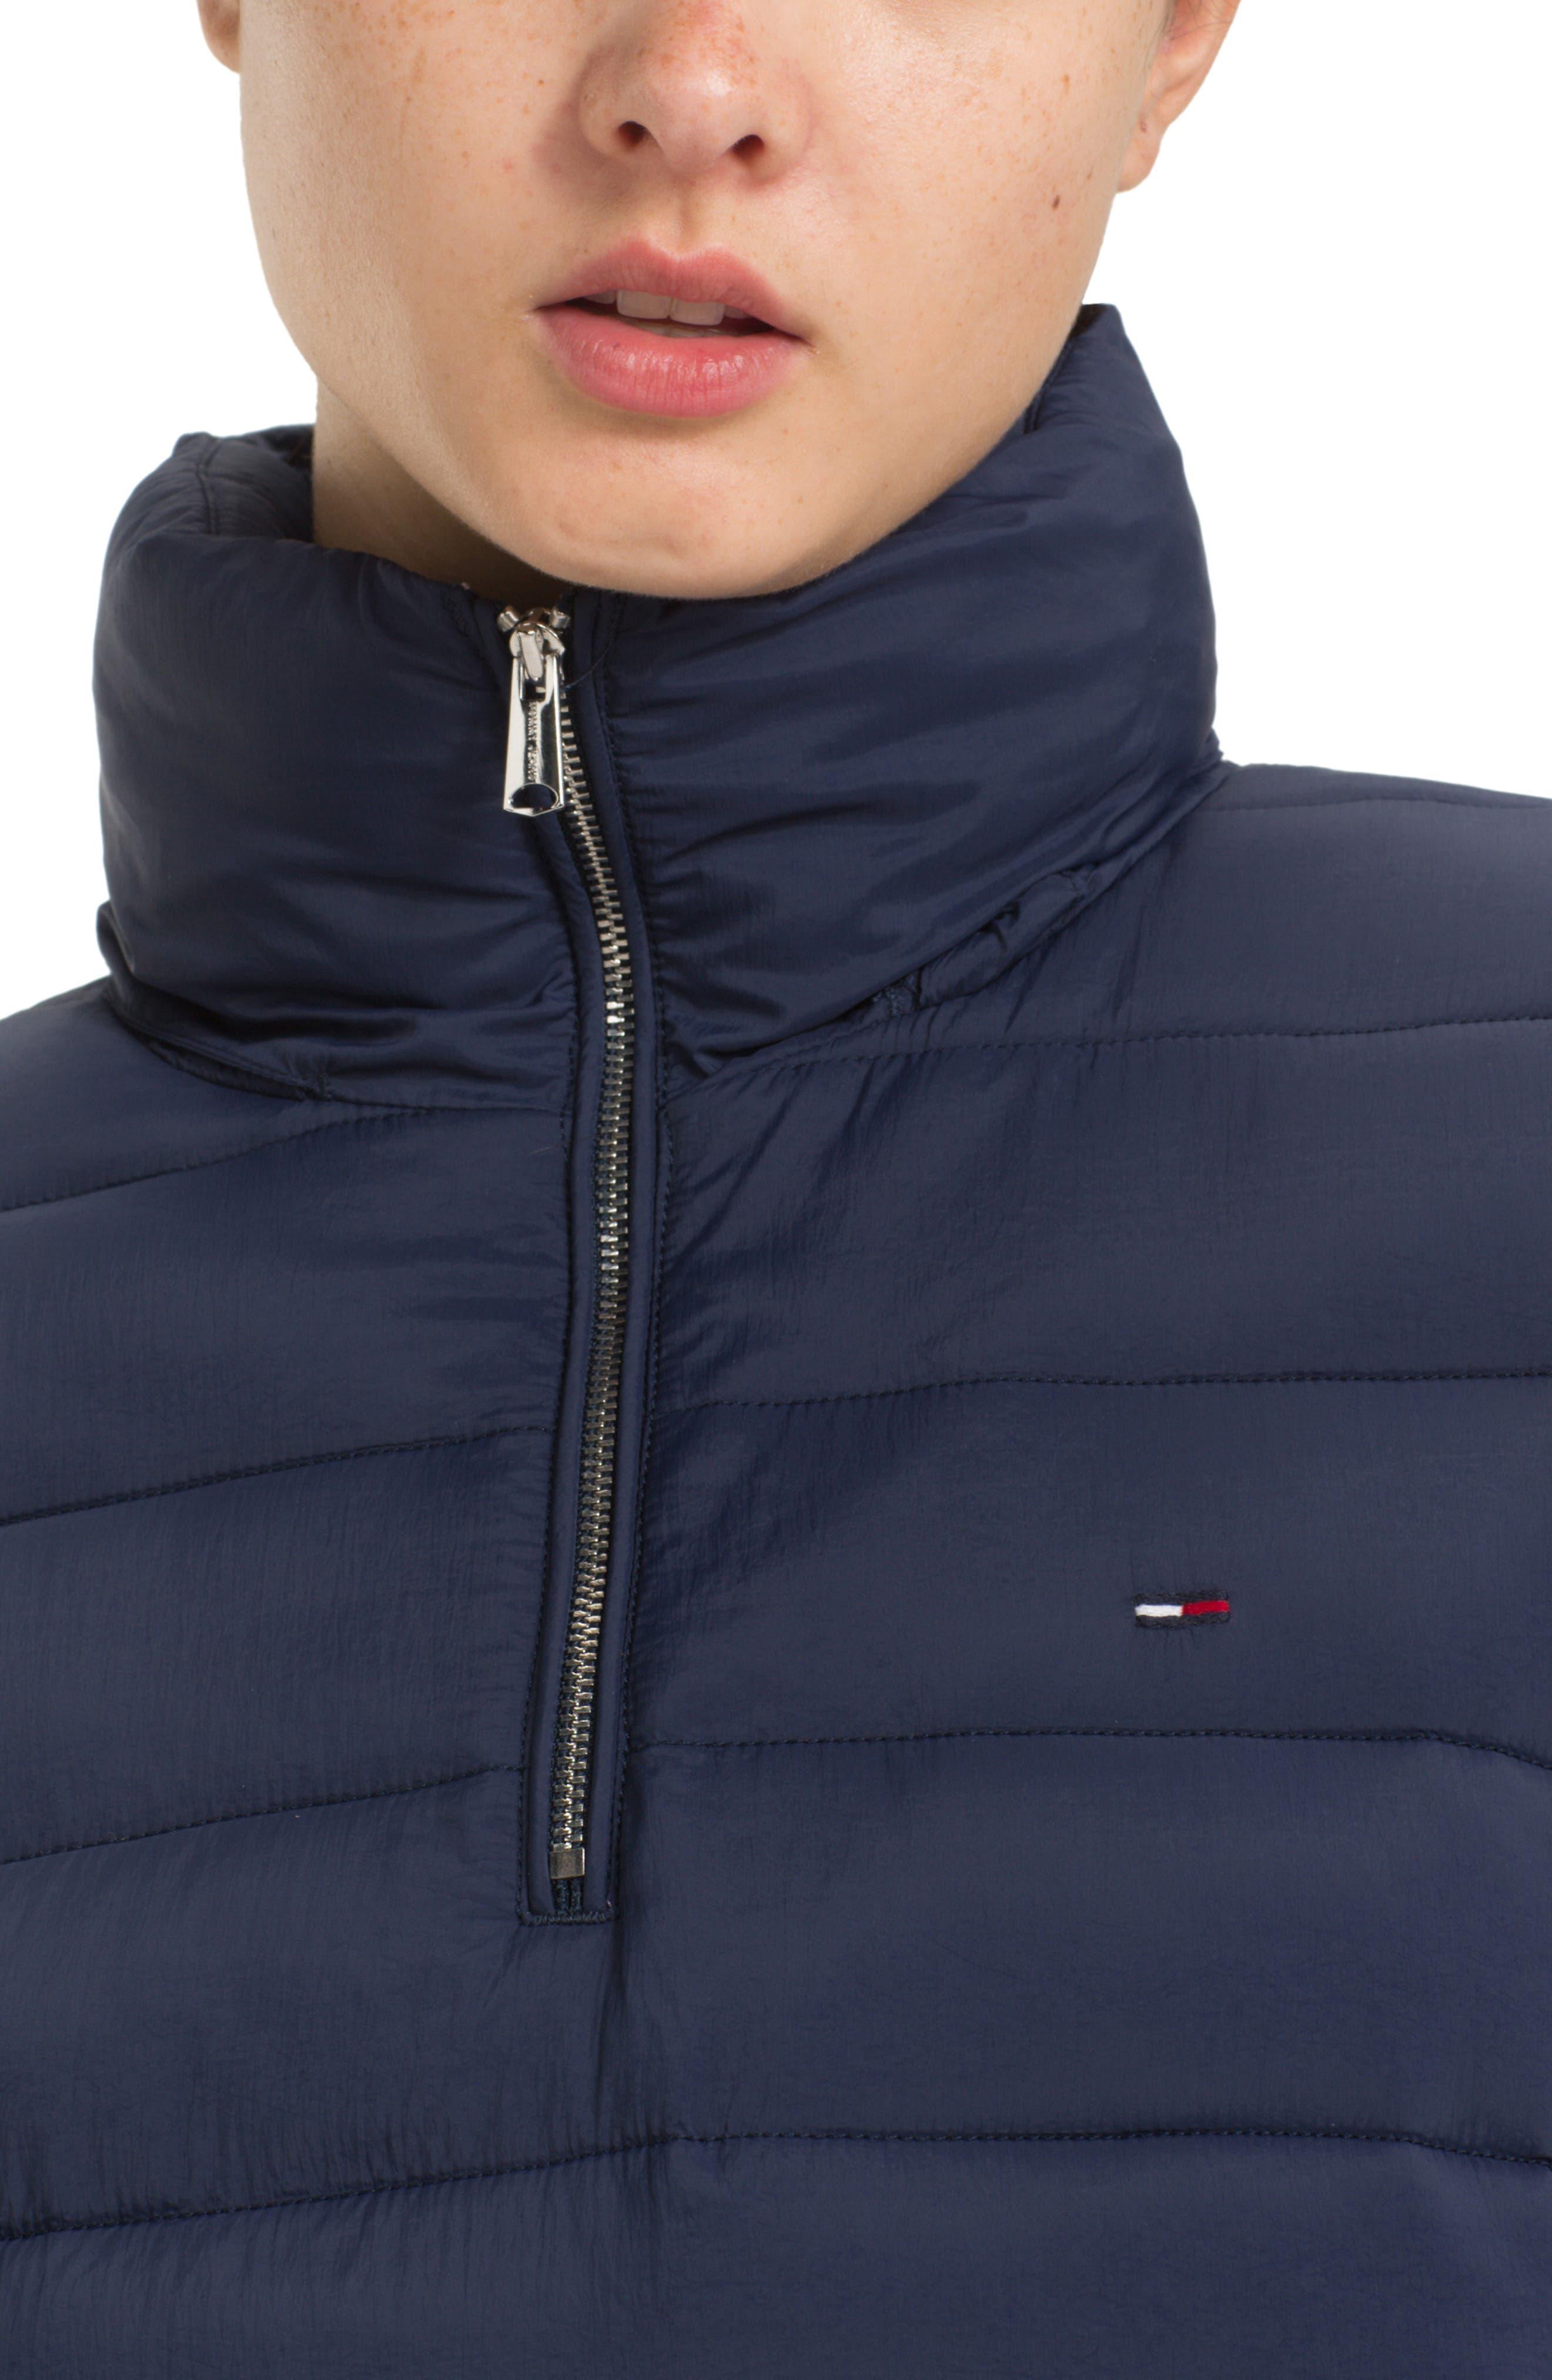 TJW Quilted Half-Zip Puffer Jacket,                             Alternate thumbnail 3, color,                             BLACK IRIS